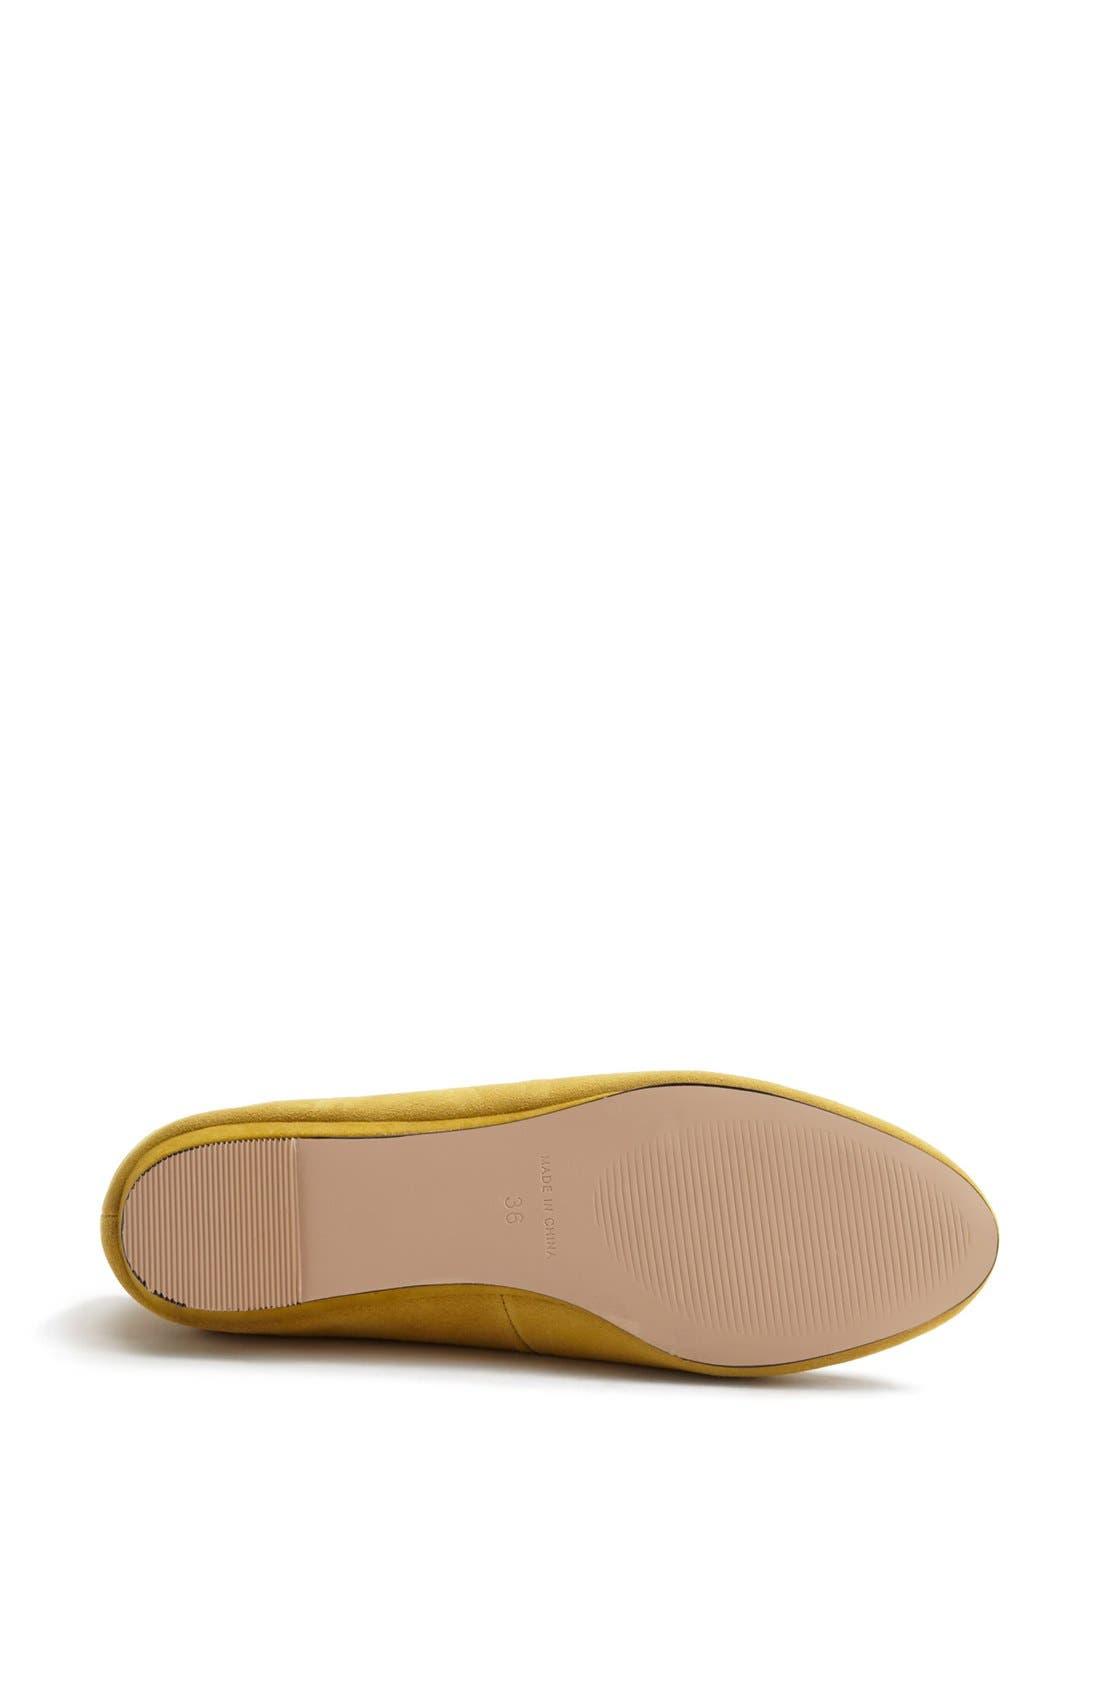 'Mello Mini Wedge' Court Shoe,                             Alternate thumbnail 4, color,                             Mustard